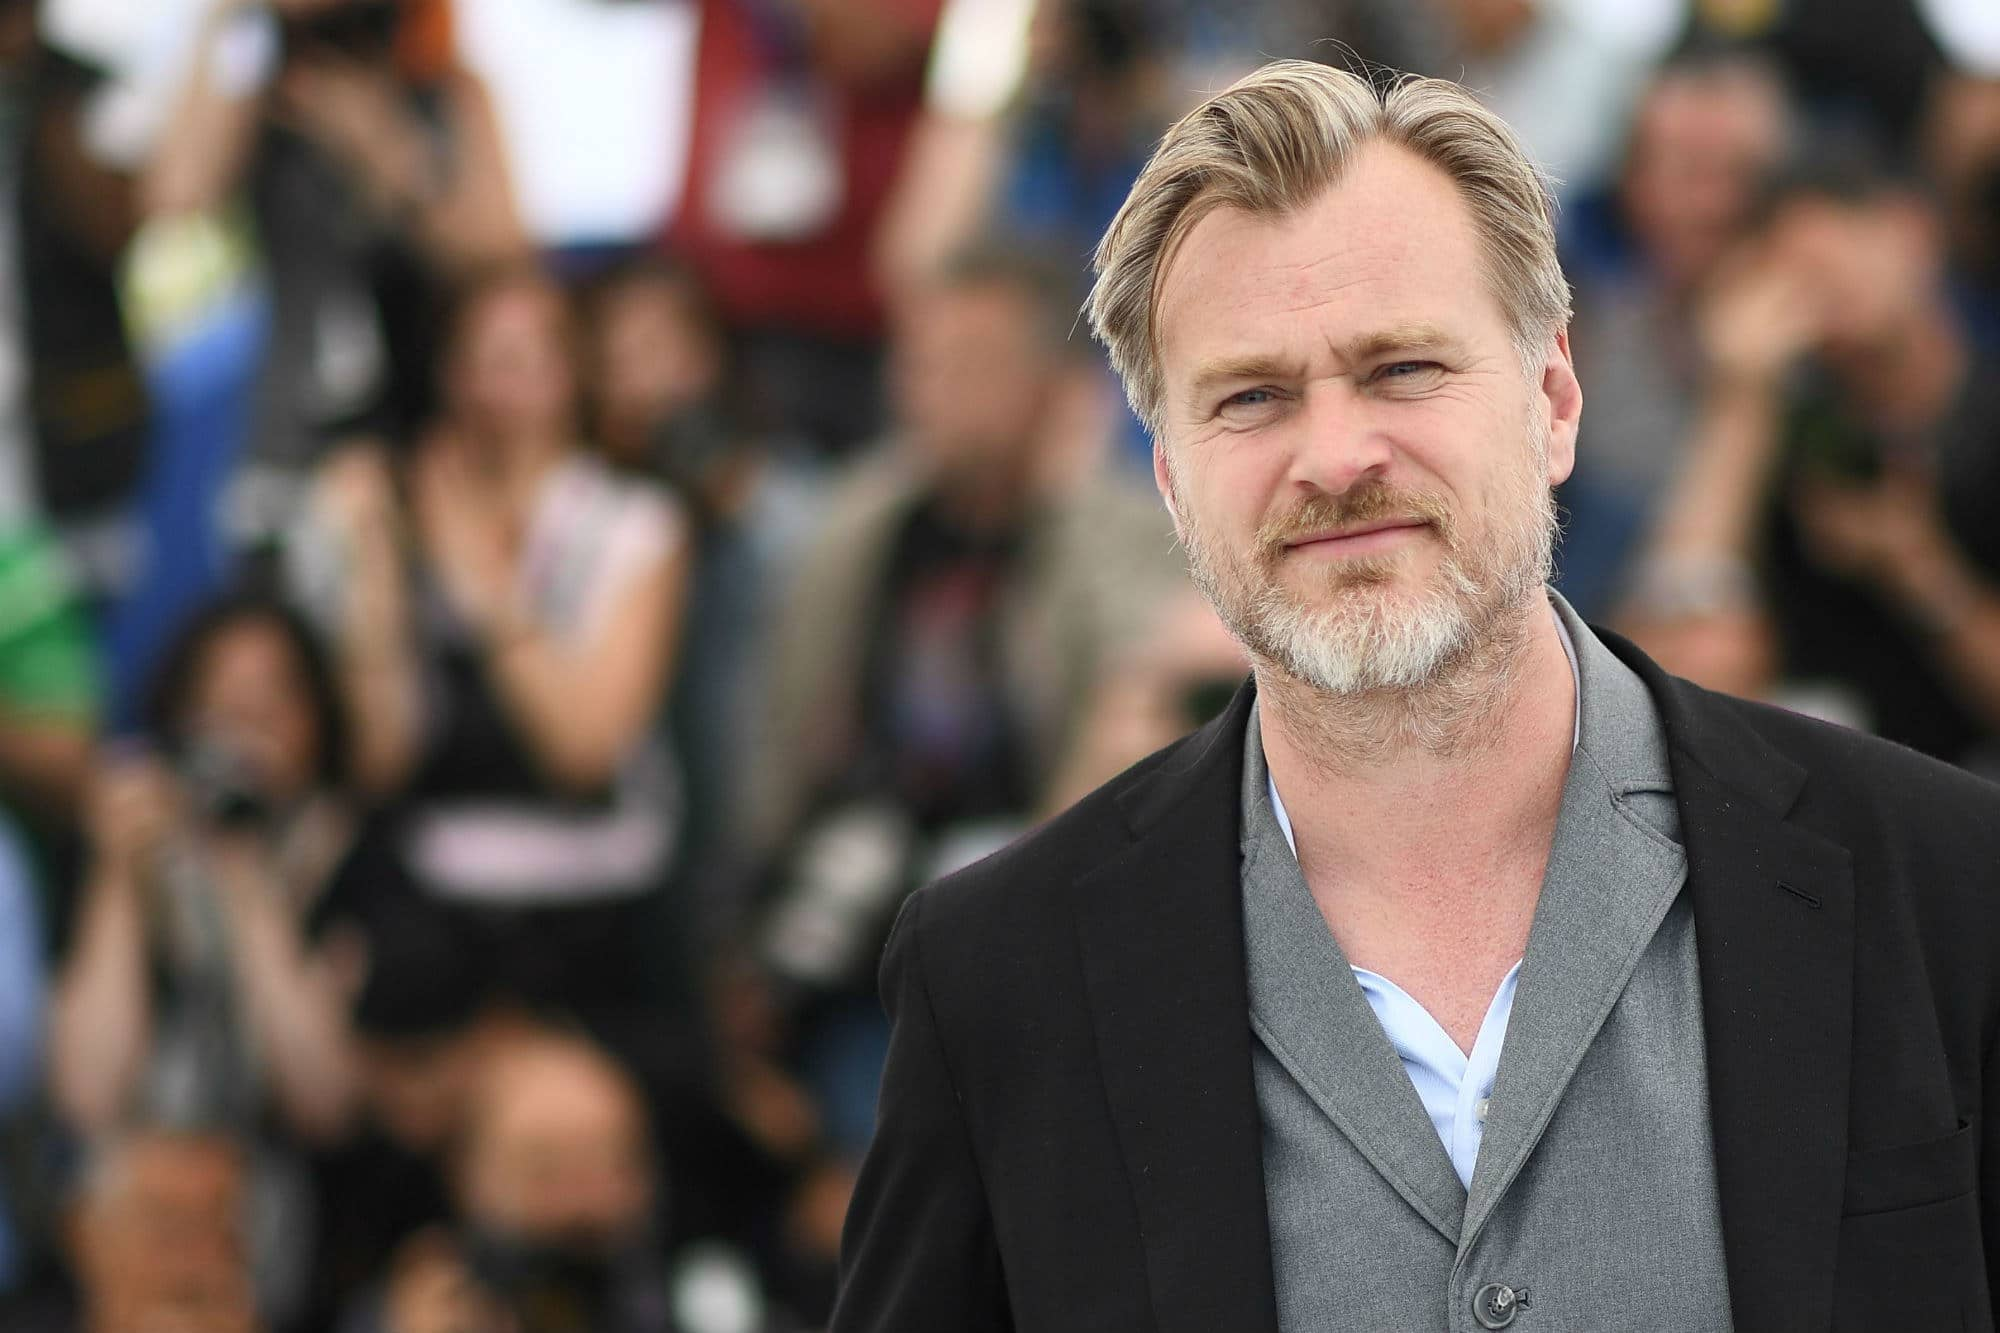 Latest addition to Christopher Nolan's 'Tenet': Aaron Taylor-Johnson, Michael Caine